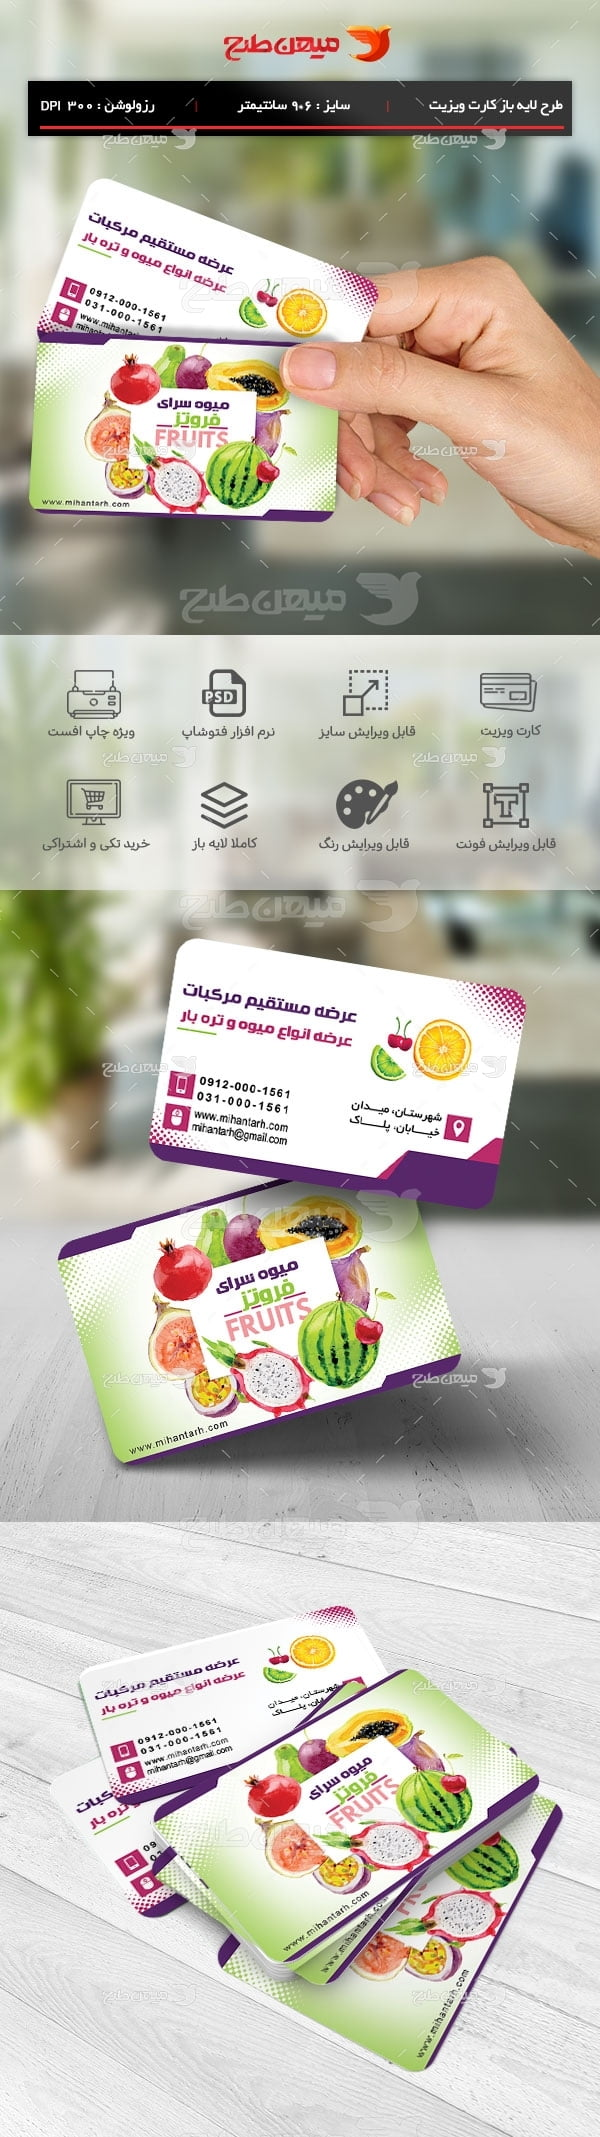 طرح لایه باز کارت ویزیت میوه سرا